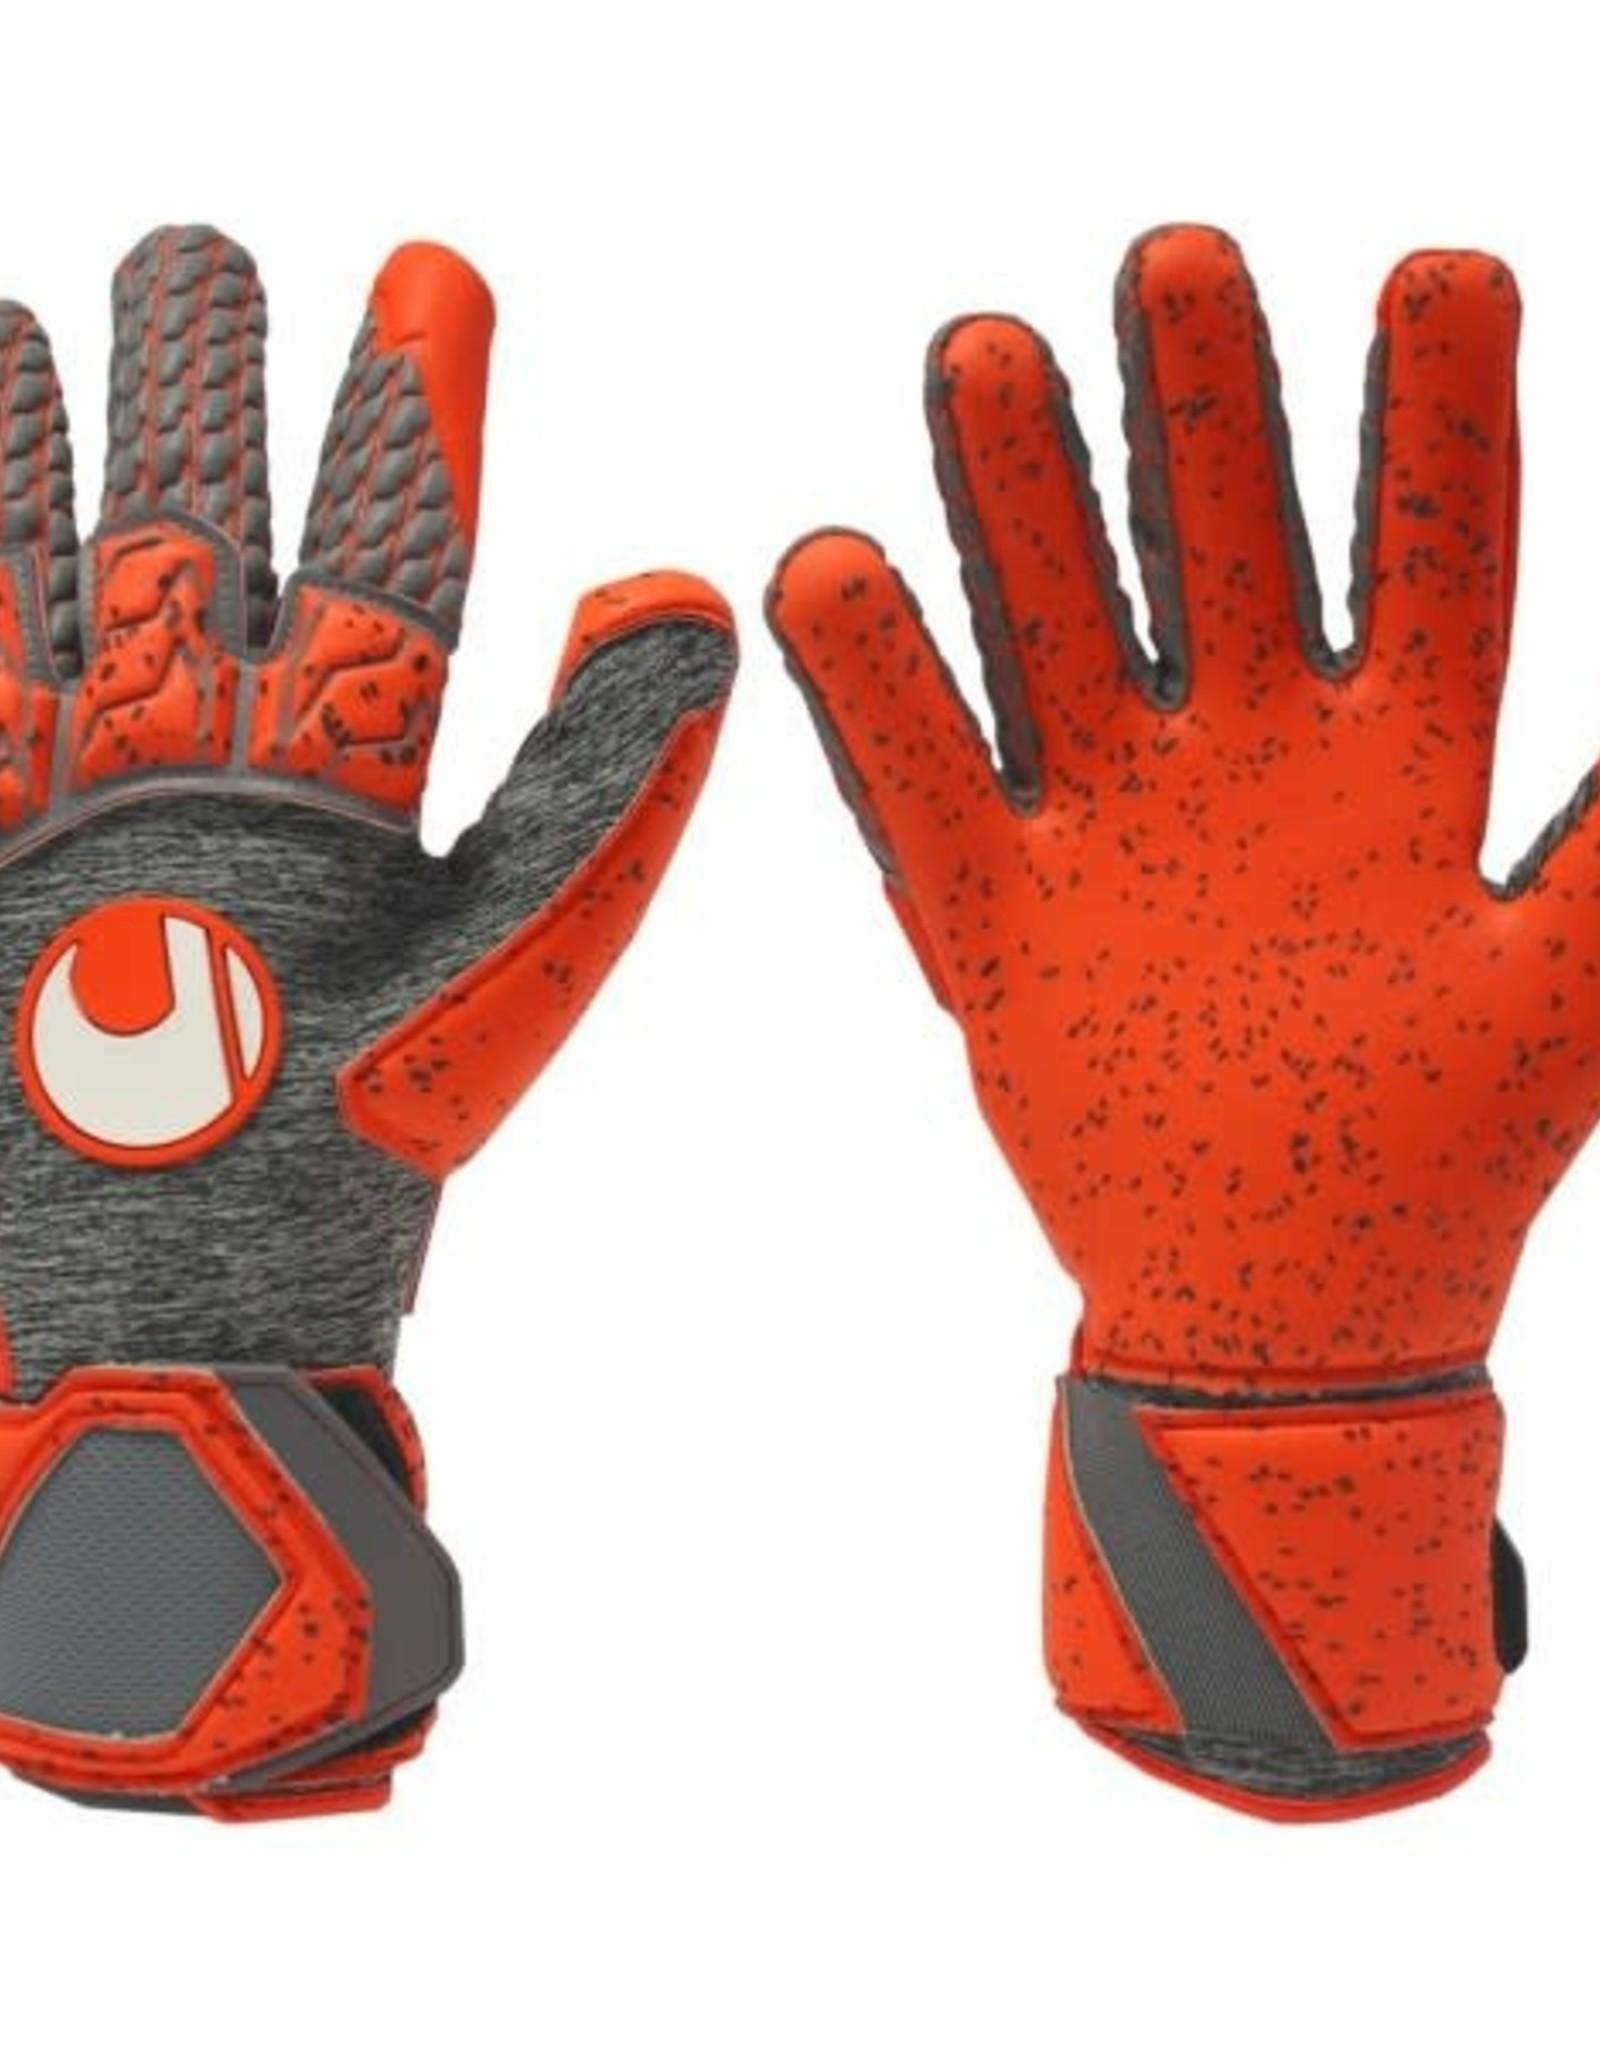 Uhlsport Uhlsport Supergrip Reflex GK Glove